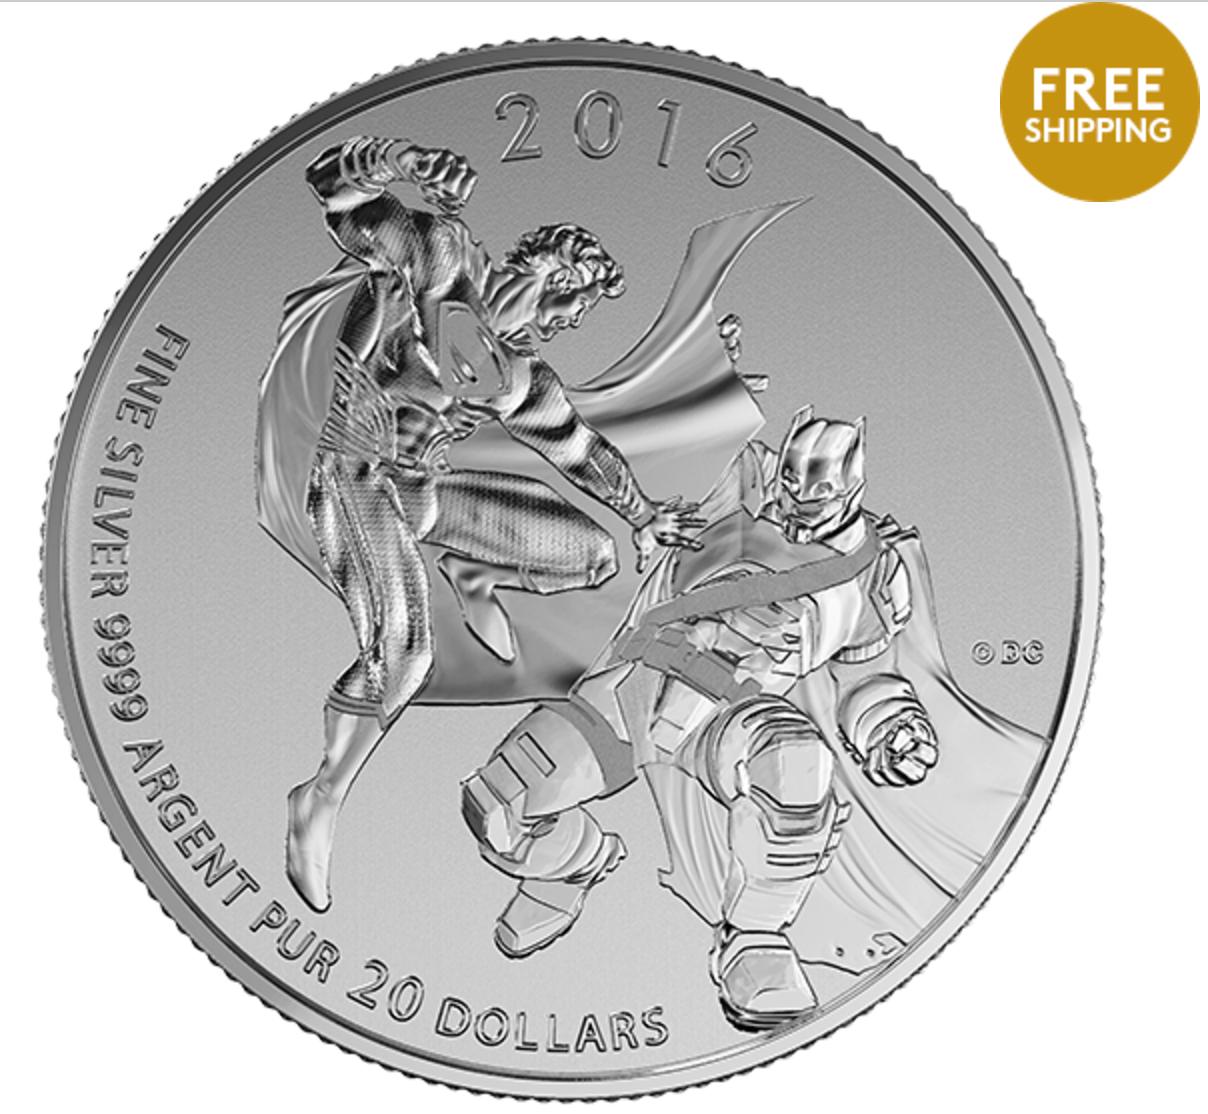 Royal Canadian Mint Deals: $20 for $20 Fine Silver Superman & Batman vs Superman Coins + FREE Shipping!